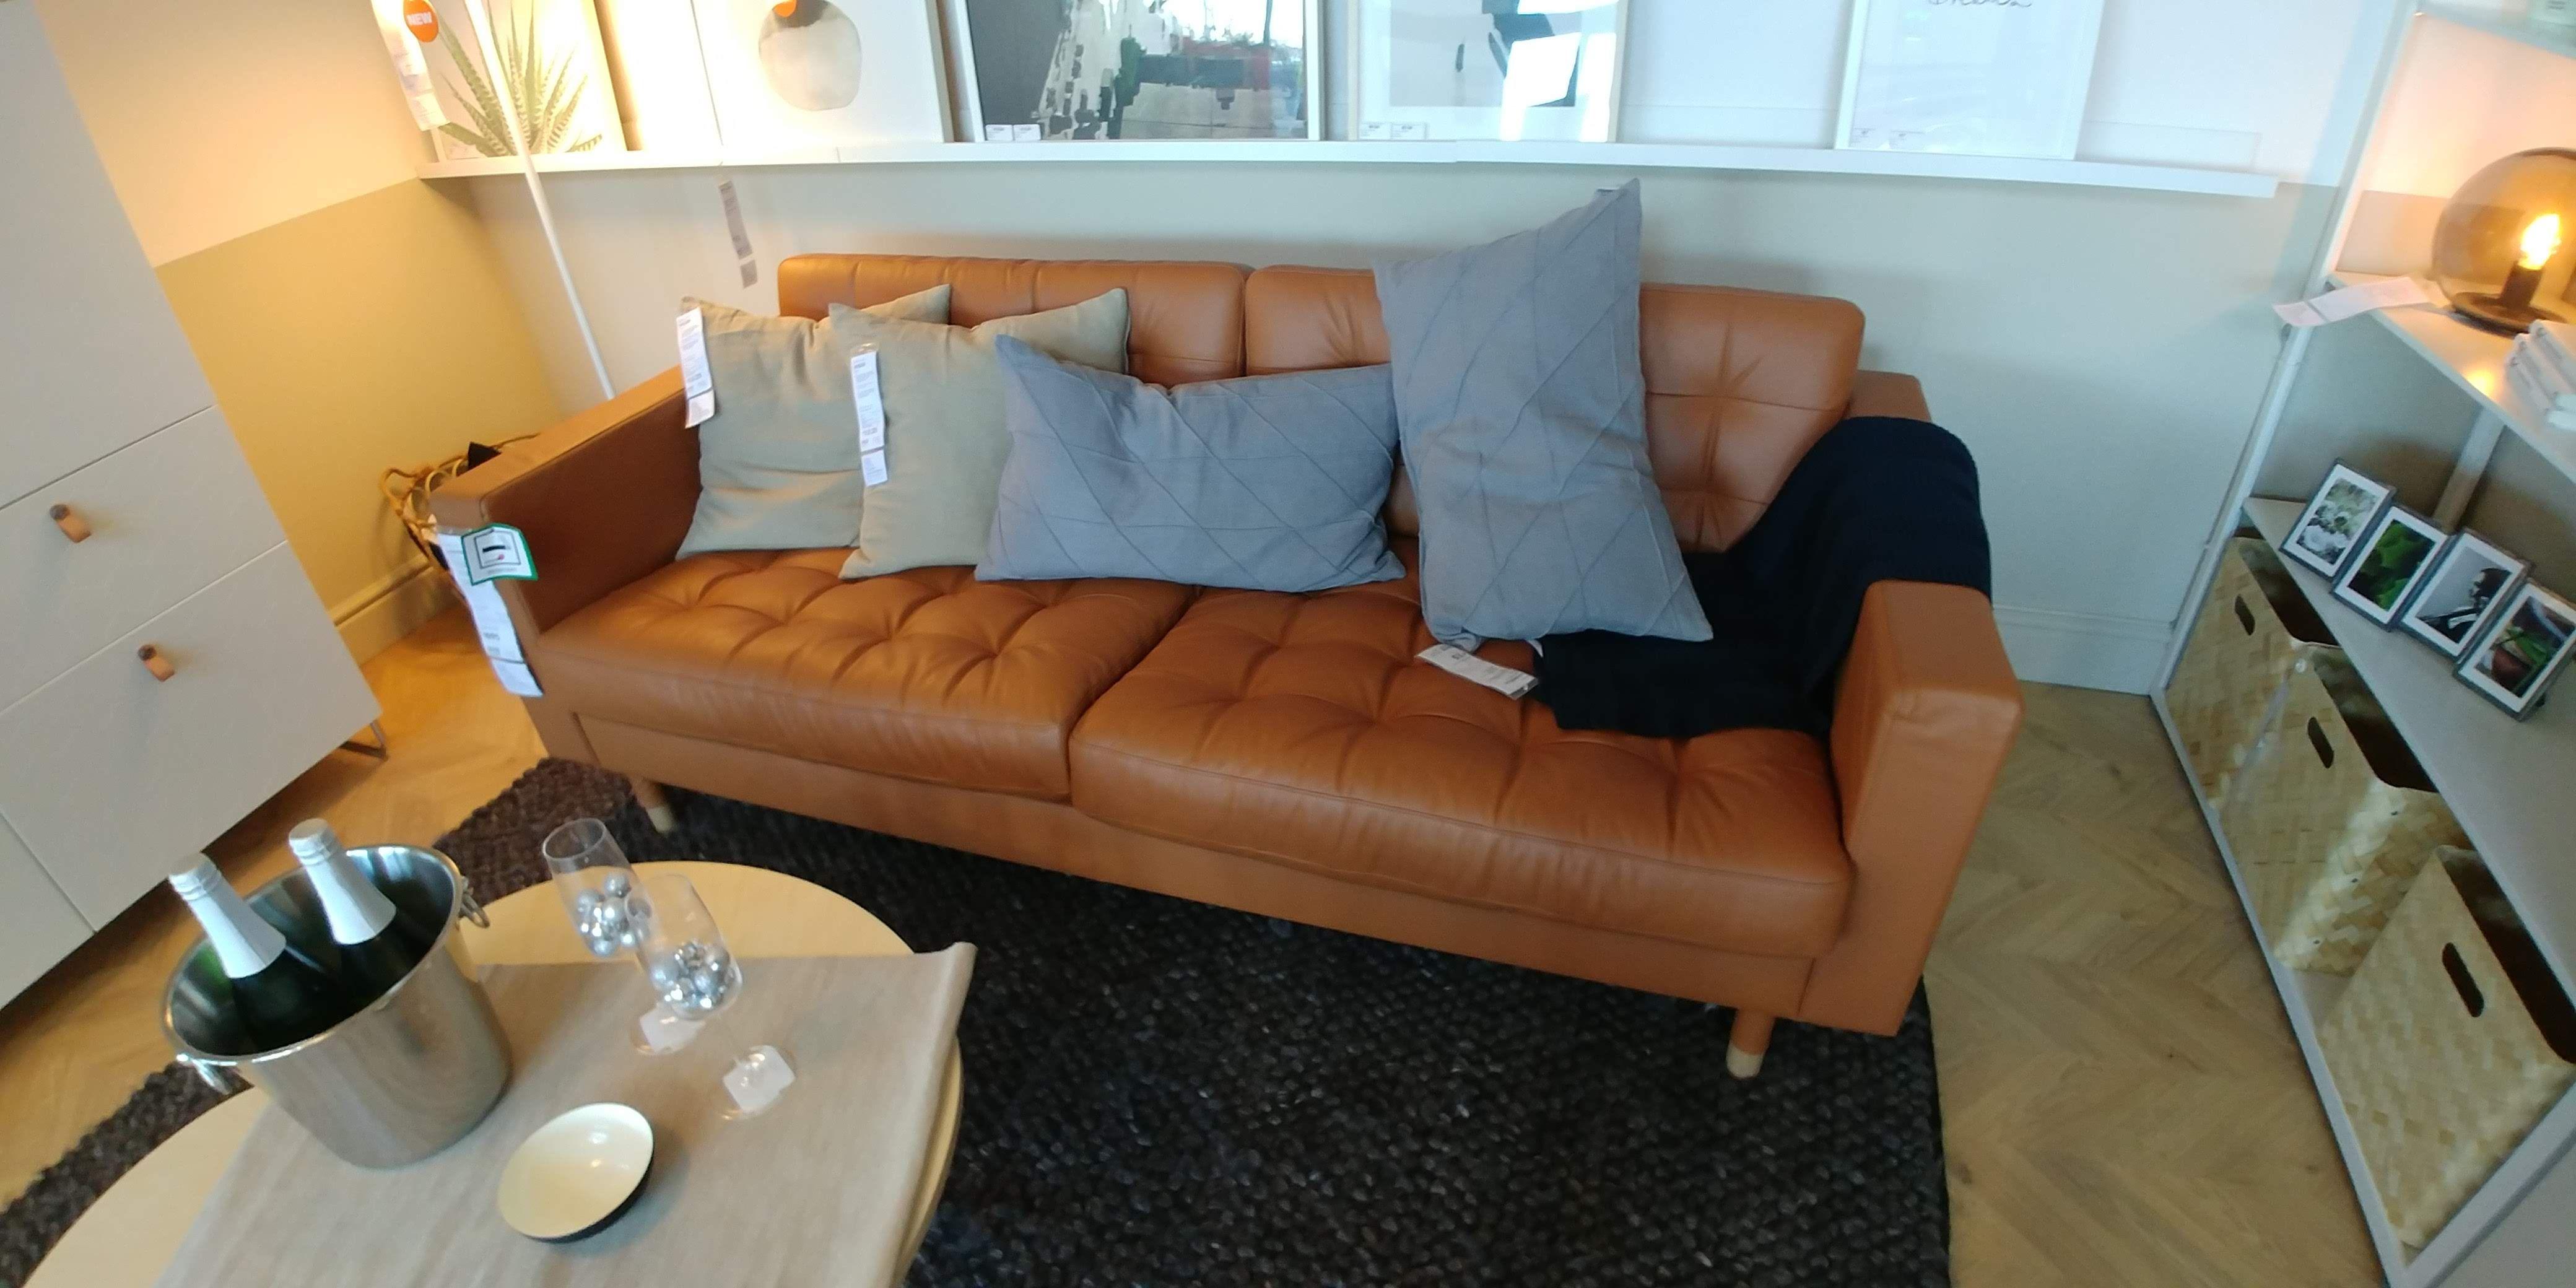 Buy Now Landskrona 3 Seat Sofa Grann Bomstad Golden Brown X 204 Cm Ikea Ireland Landskrona Sofa Ikea Landskrona Brown Leather Sofa